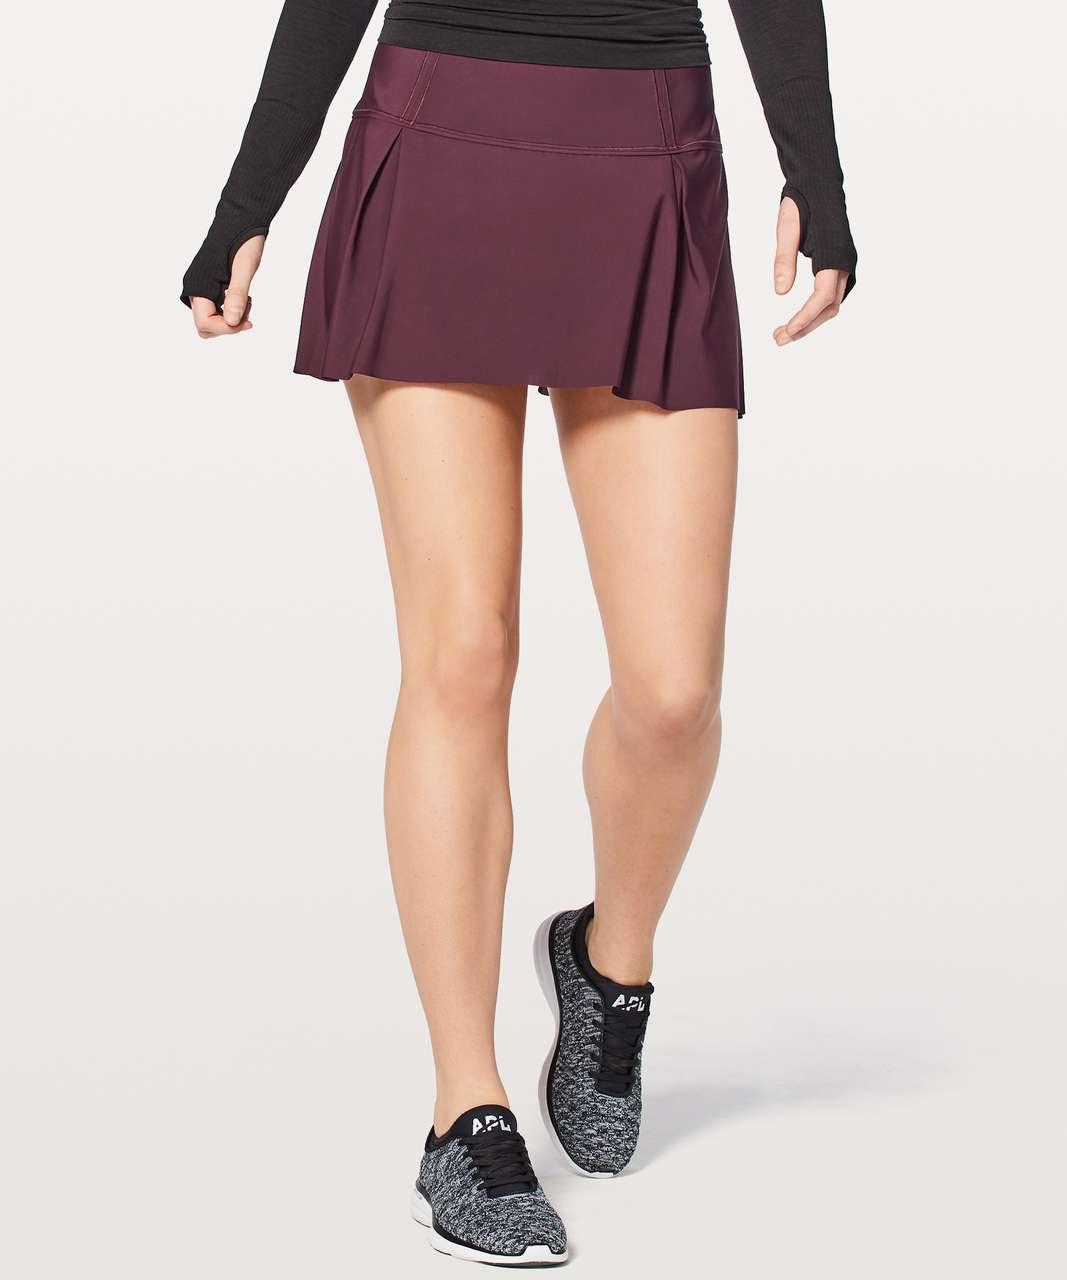 "Lululemon Lost In Pace Skirt (Tall) 15"" - Dark Adobe"